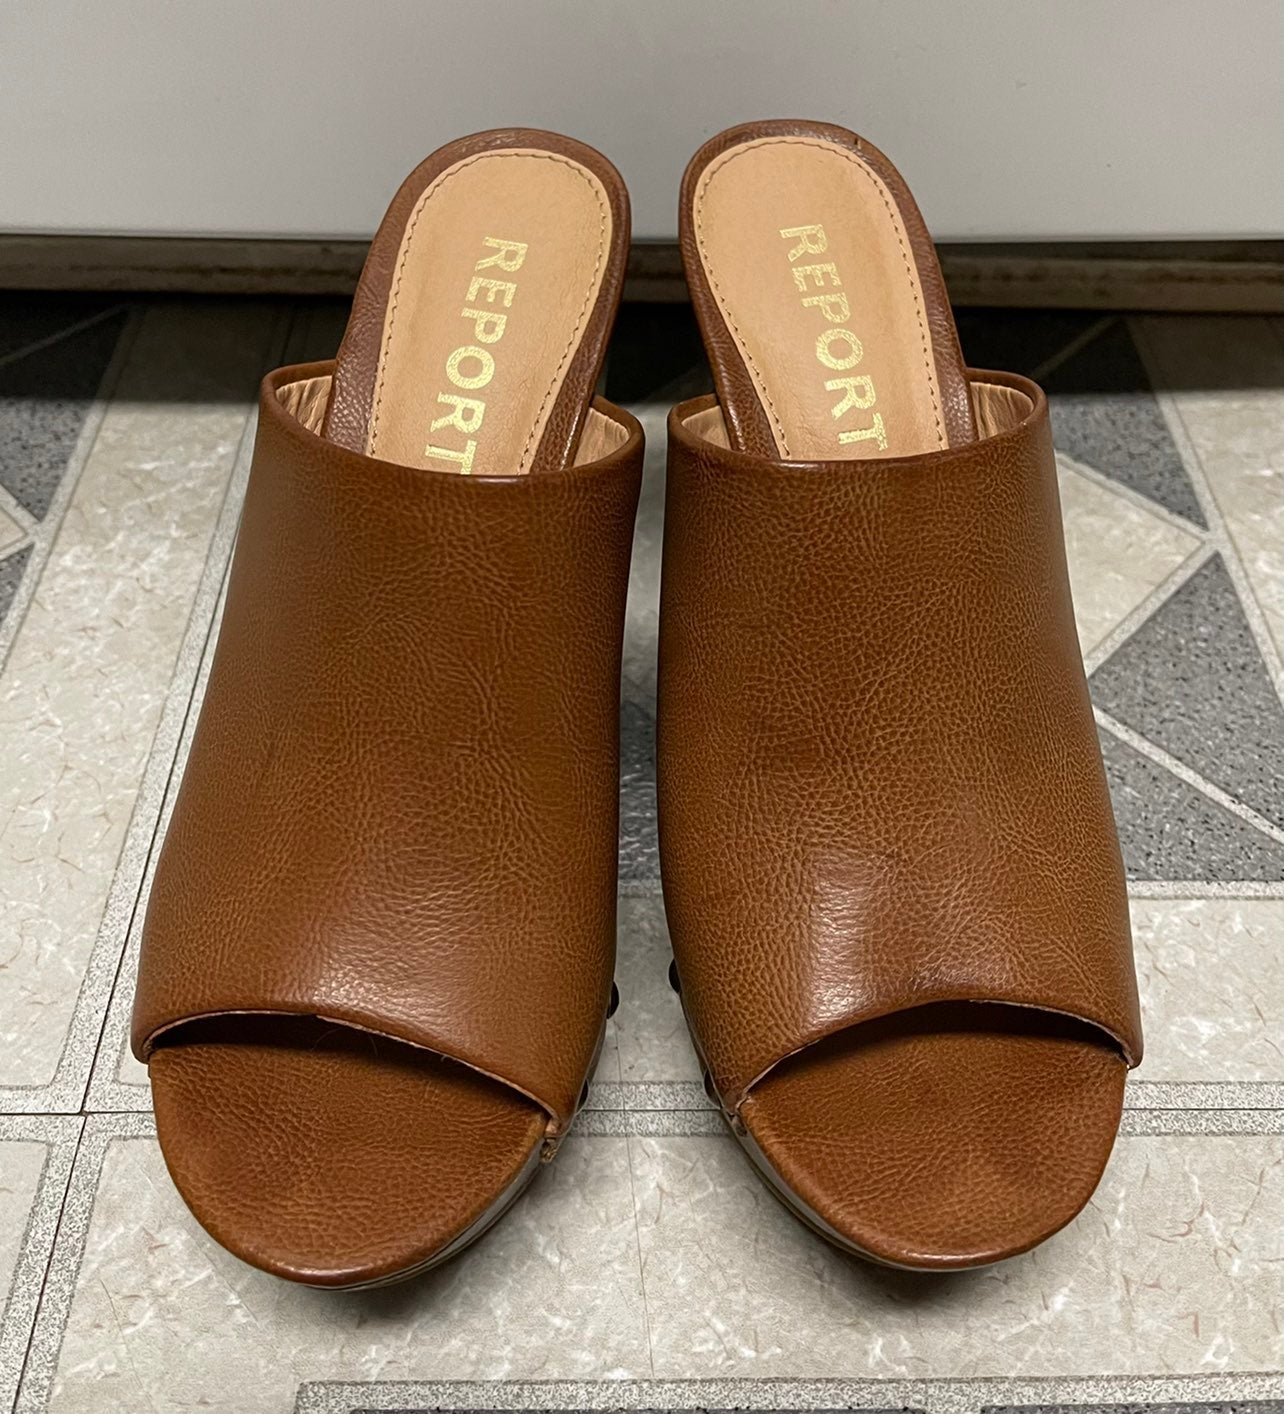 Report Eaden leather sandals/clogs/mules